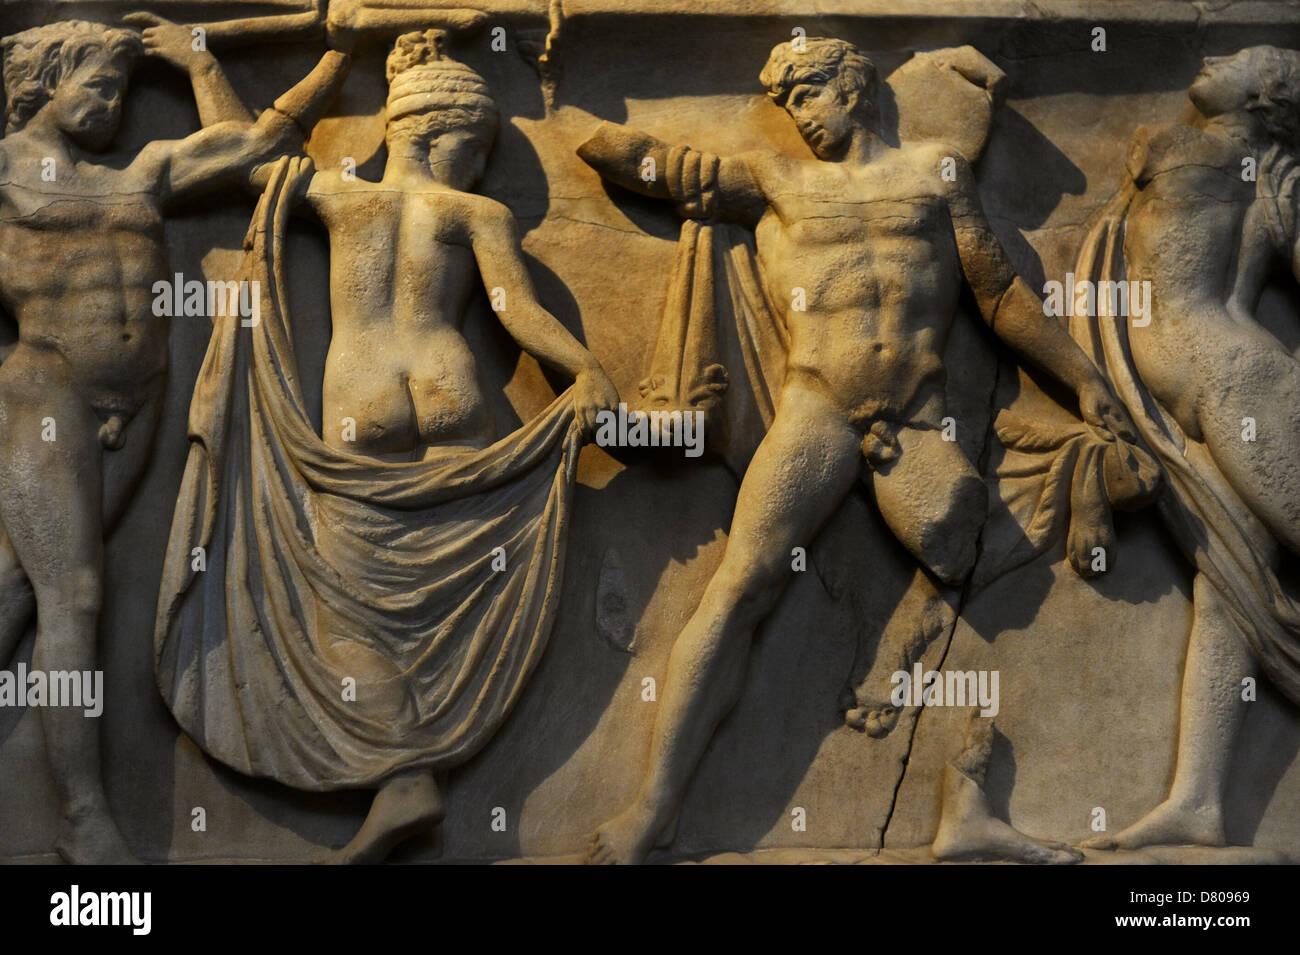 Front side of sarcophagus. Modern work after 2nd century AD originals. Marriage of Dionysus and Adriane. Glyptothek. Munich. Stock Photo